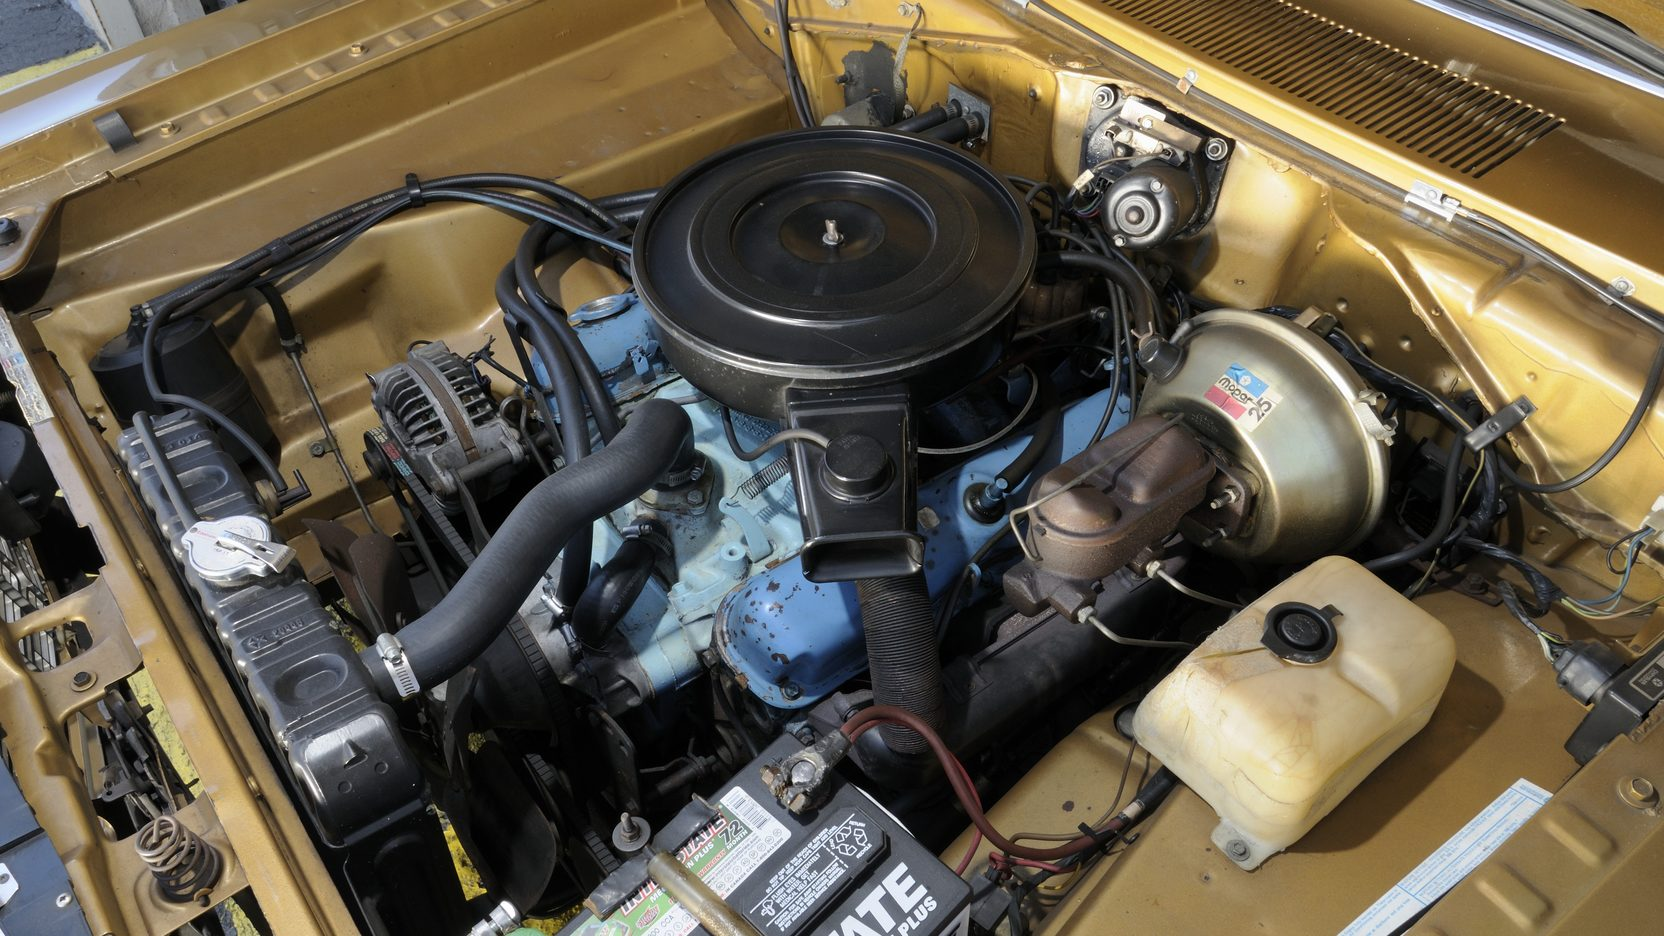 1973 Plymouth Duster Mopar 318 engine